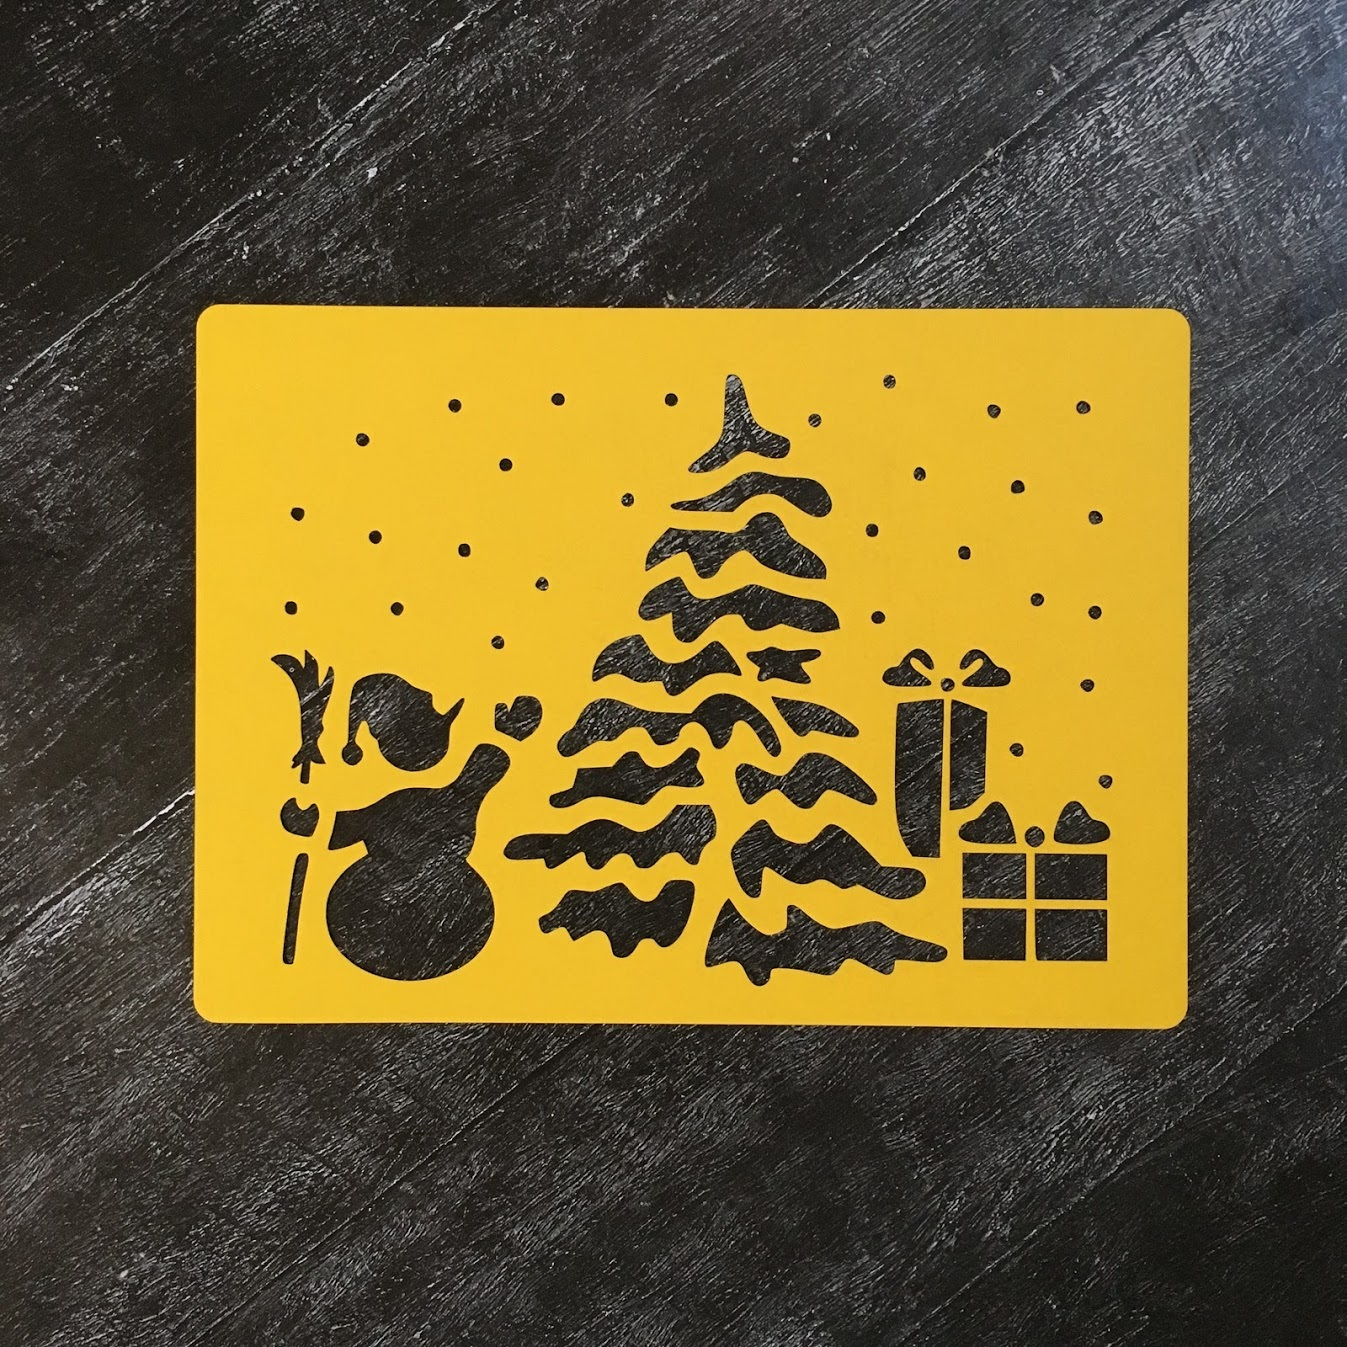 Трафарет новогодний №9 Снеговик и ёлка с подарками